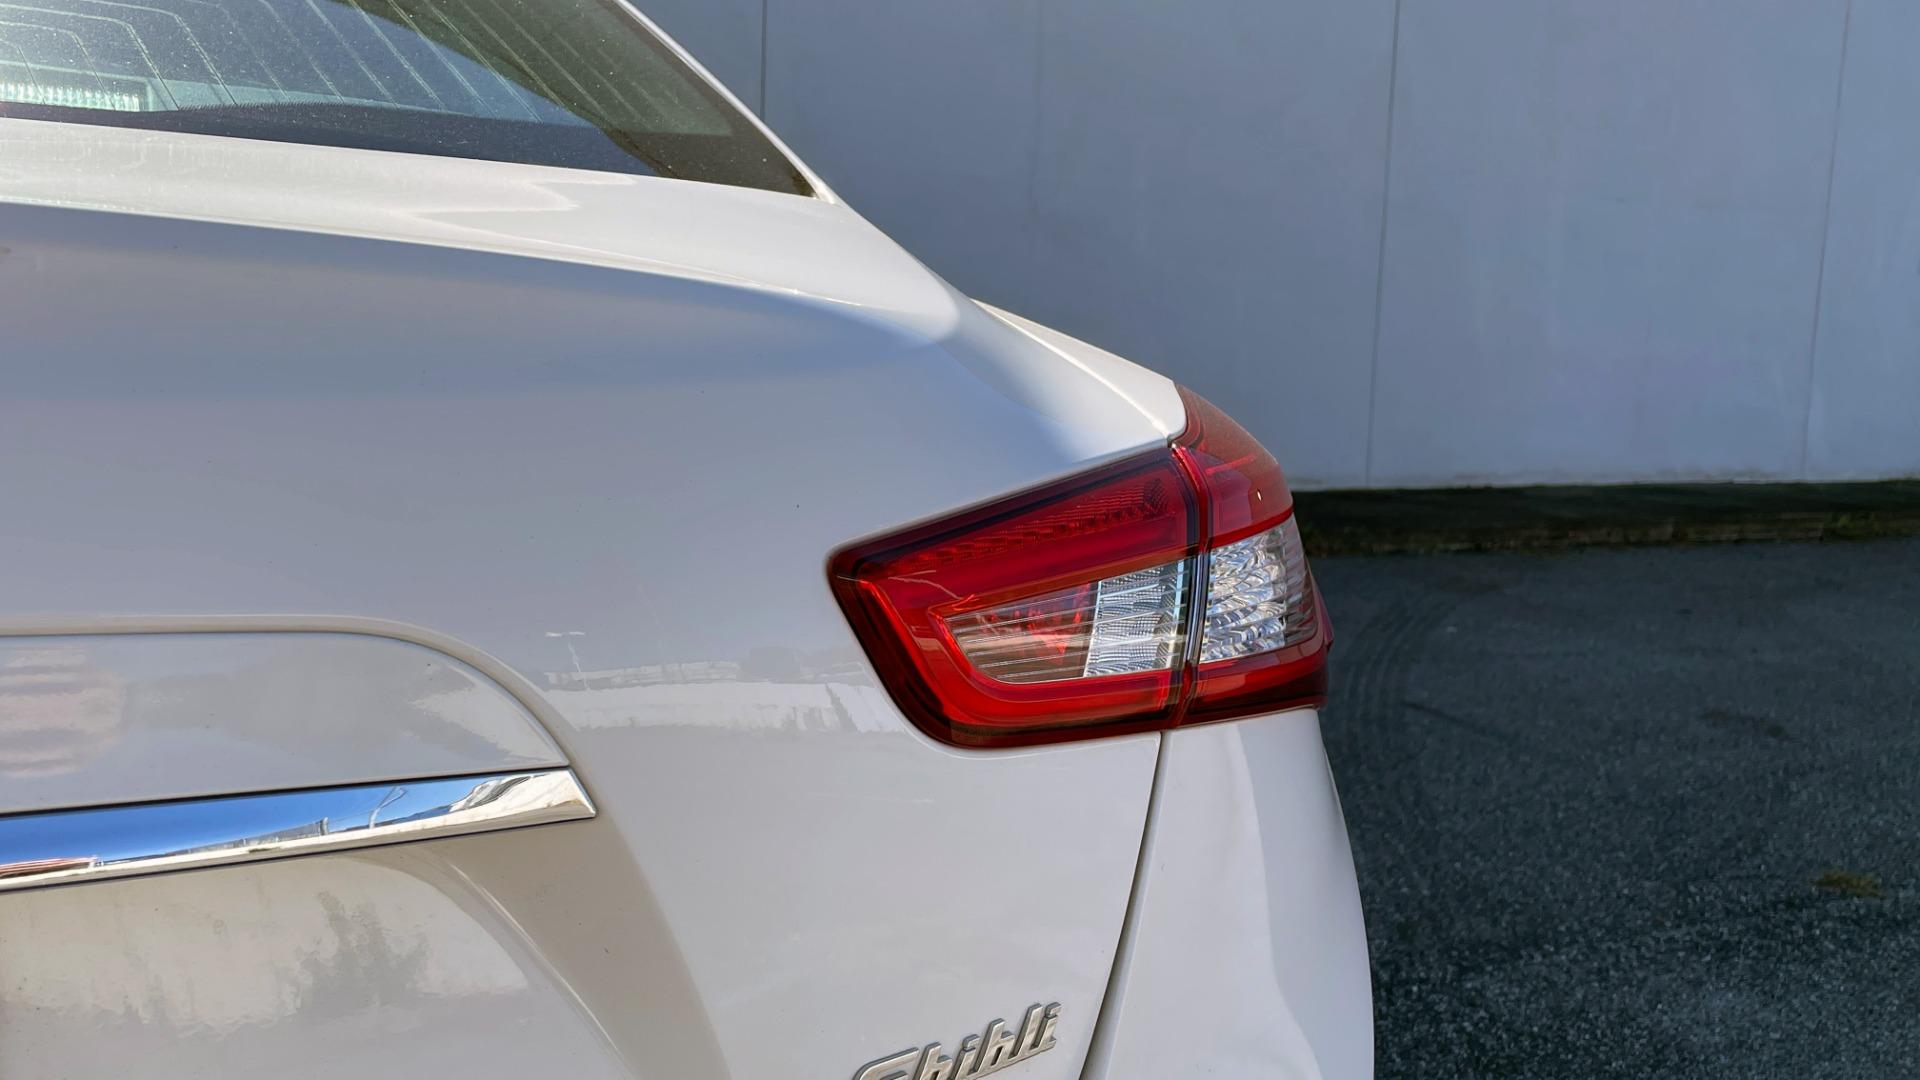 Used 2018 Maserati GHIBLI SEDAN / RWD / 3.0L V6 / SUNROOF / NAV / REARVIEW for sale $42,995 at Formula Imports in Charlotte NC 28227 26